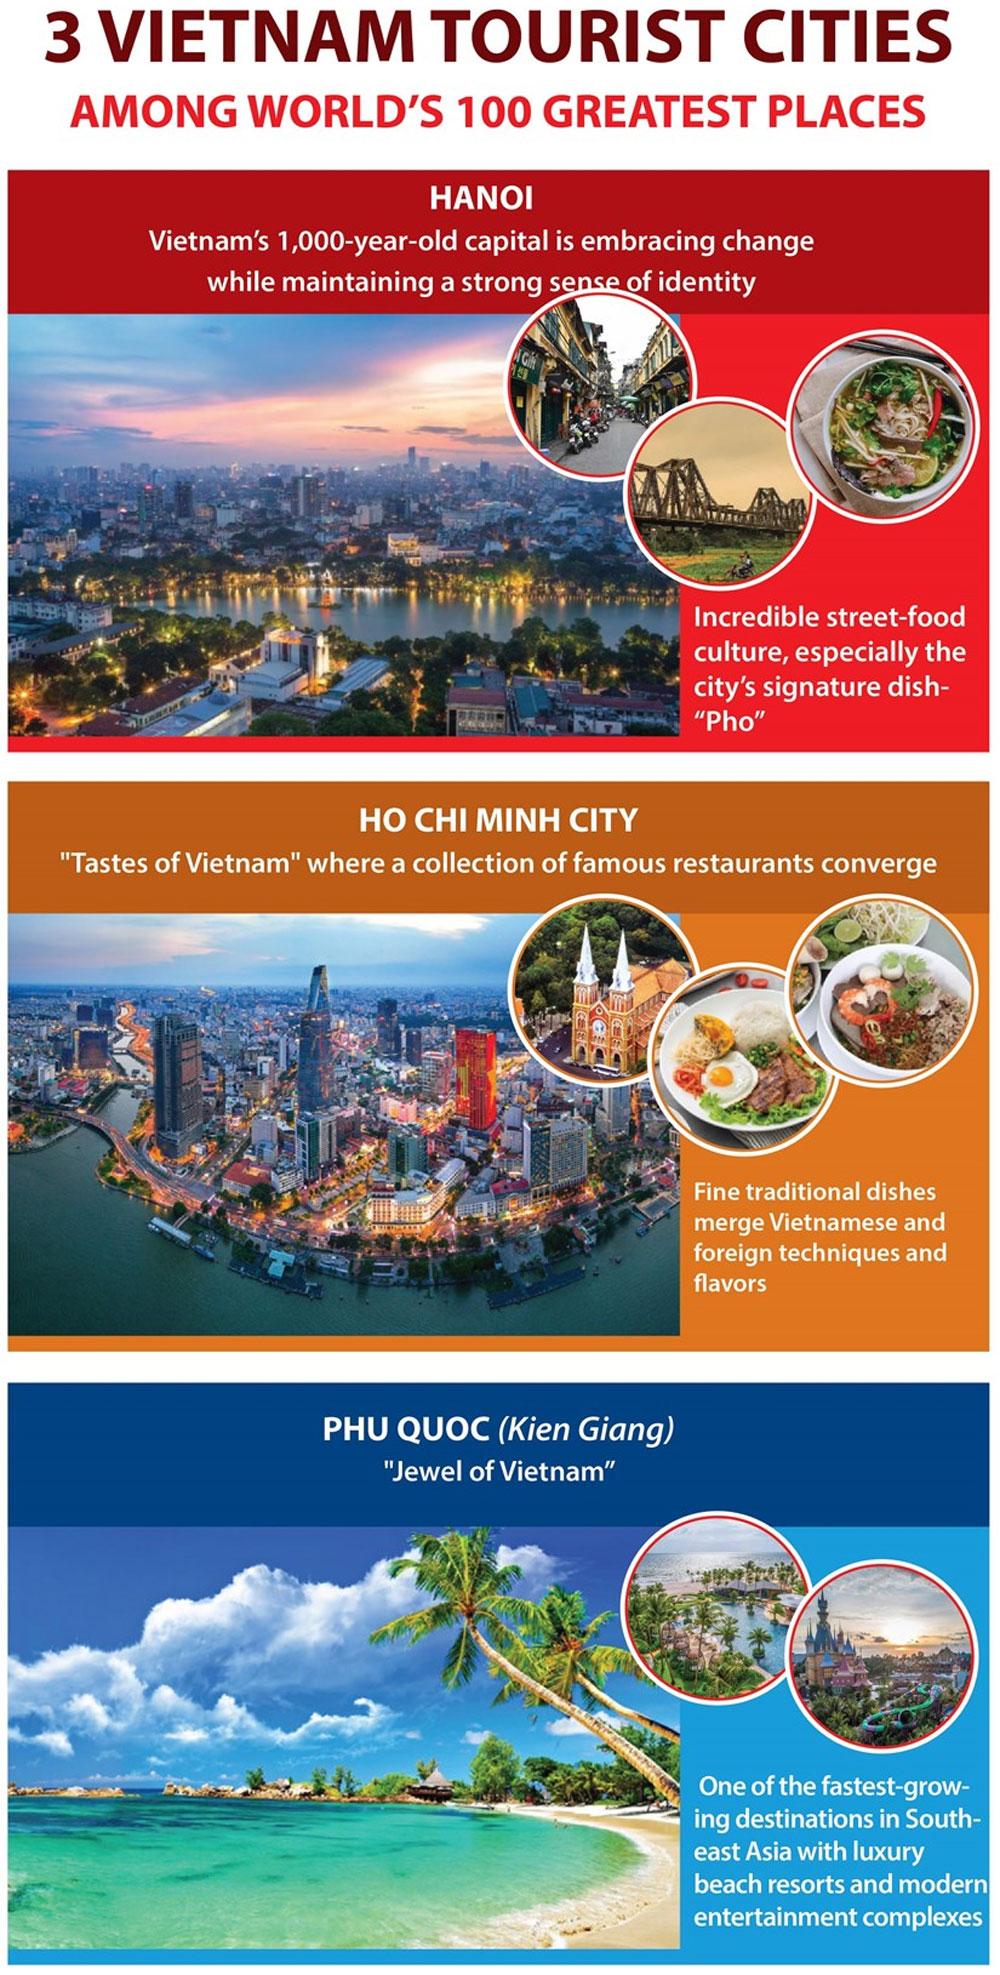 Three Vietnam tourist cities, world's 100 greatest places, Hanoi, Ho Chi Minh city, Phu Quoc, global list